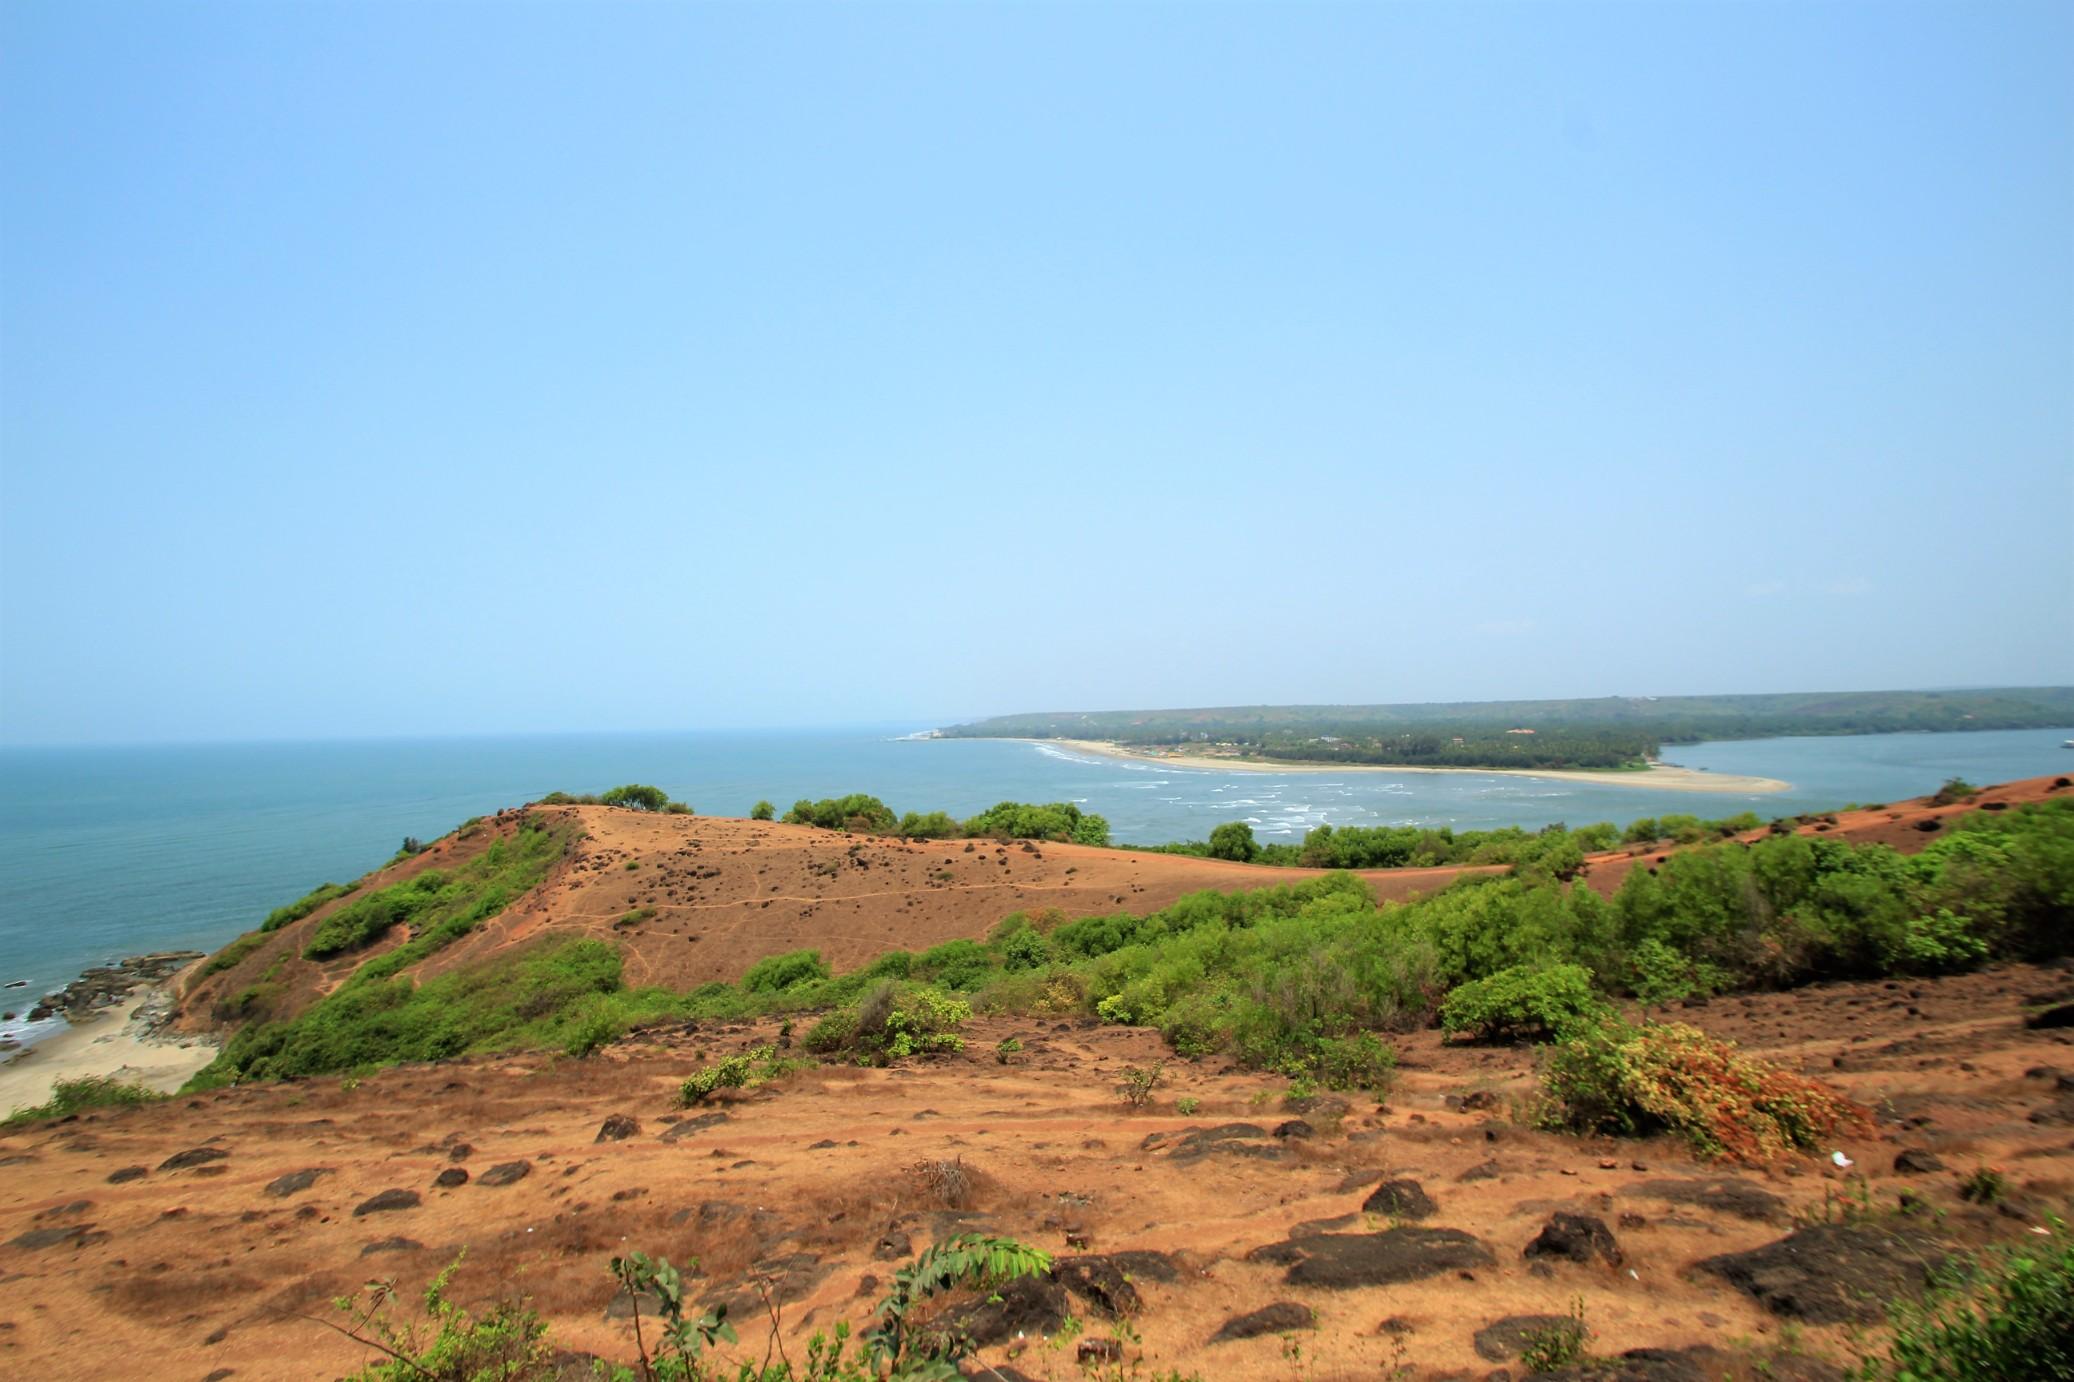 Looking North to Morjim Beach